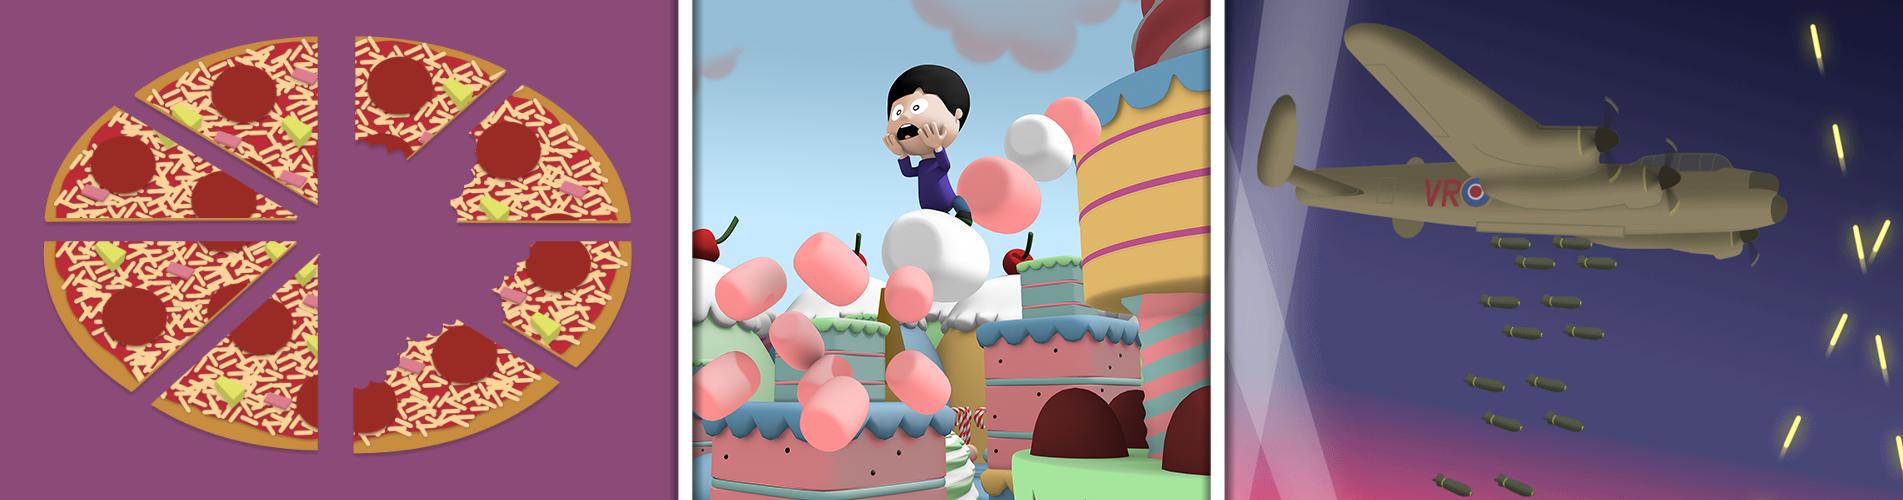 Hodman Animation images for home page slider